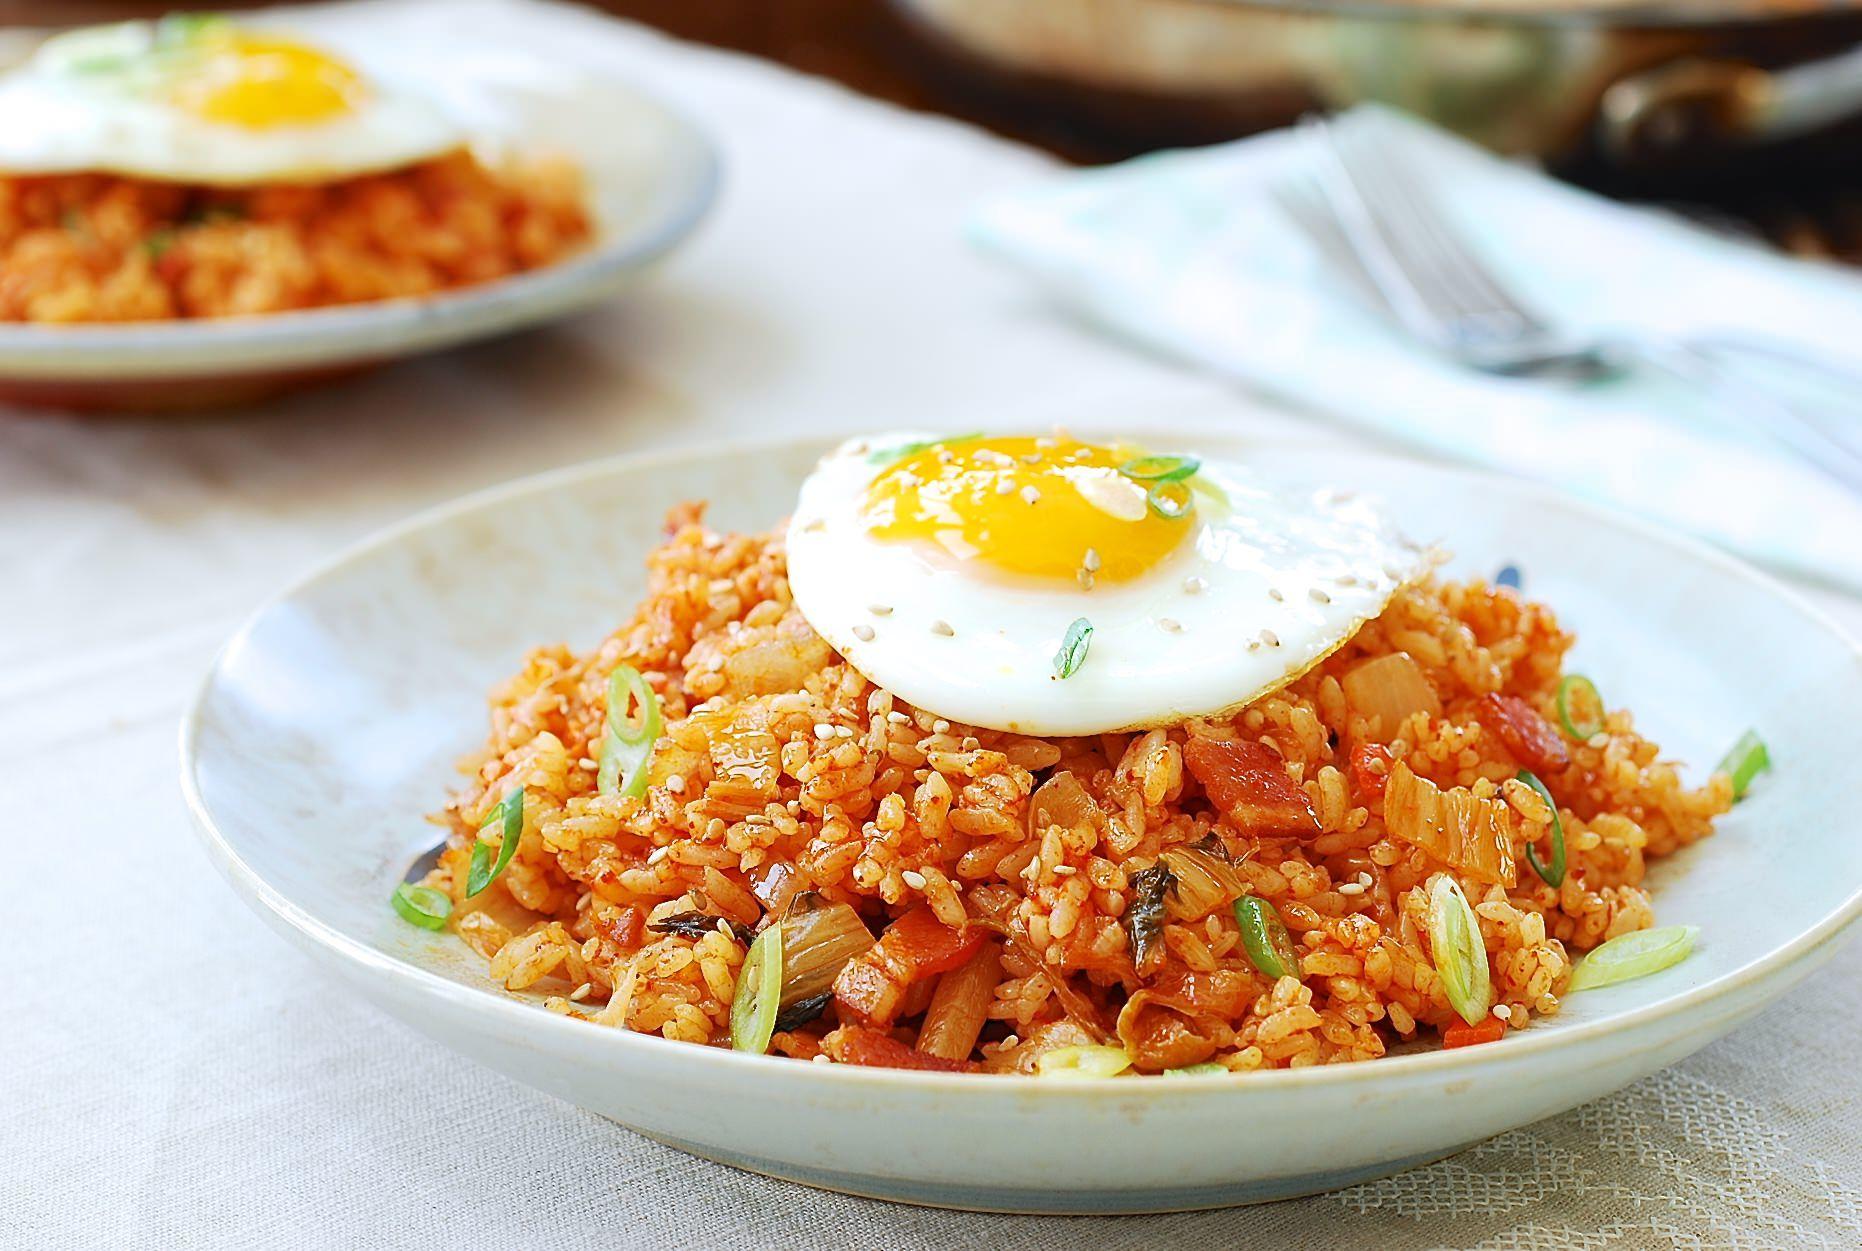 Lezat dan Praktis, 8 Resep Makanan Korea yang Memanjakan Lidah